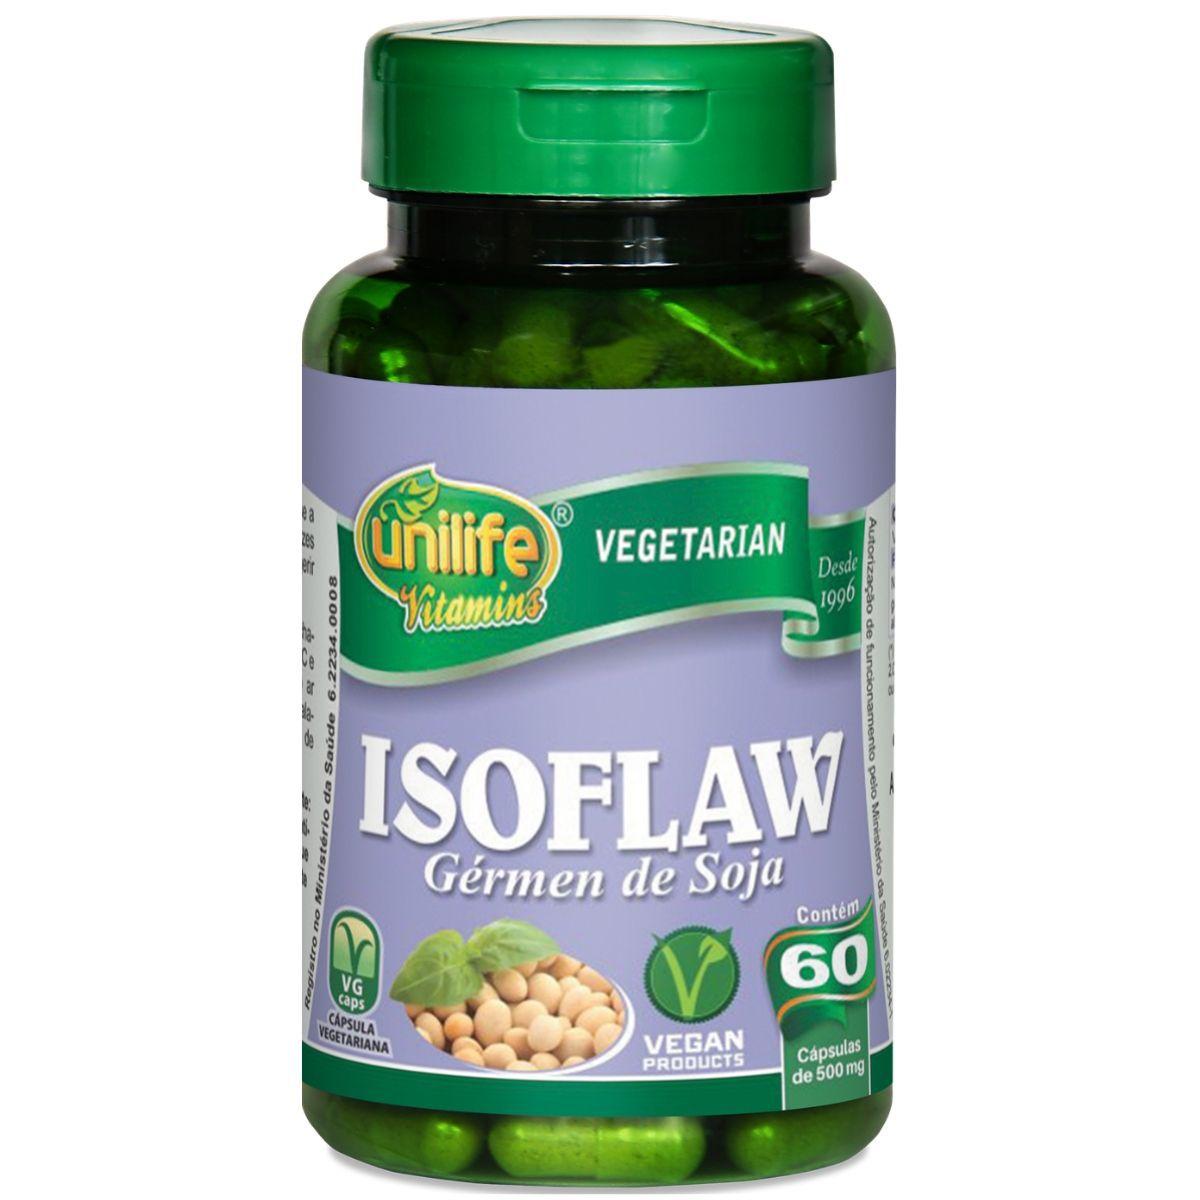 Isoflaw Gérmen de Soja 500mg 60 Cápsulas - Unilife